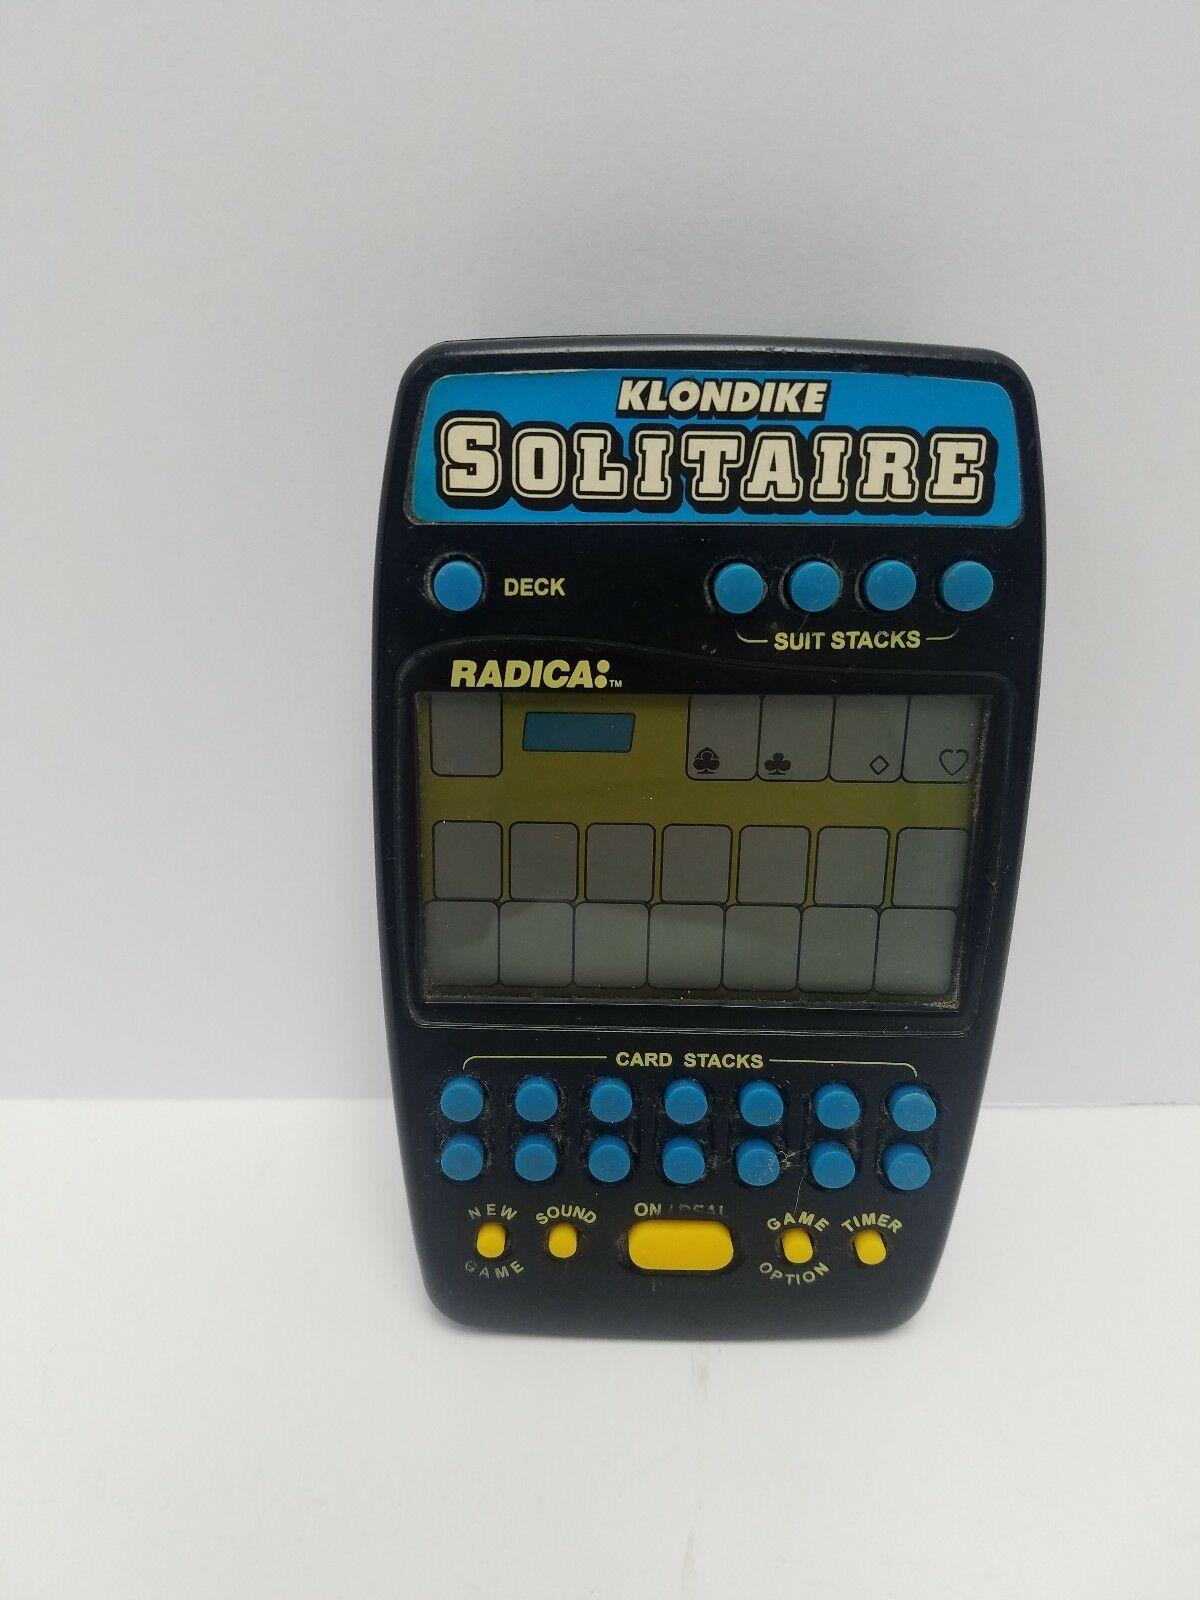 Radica Klondike Solitaire Model 2320 2320 2320 Electronic Handheld Portable Travel Game daf926